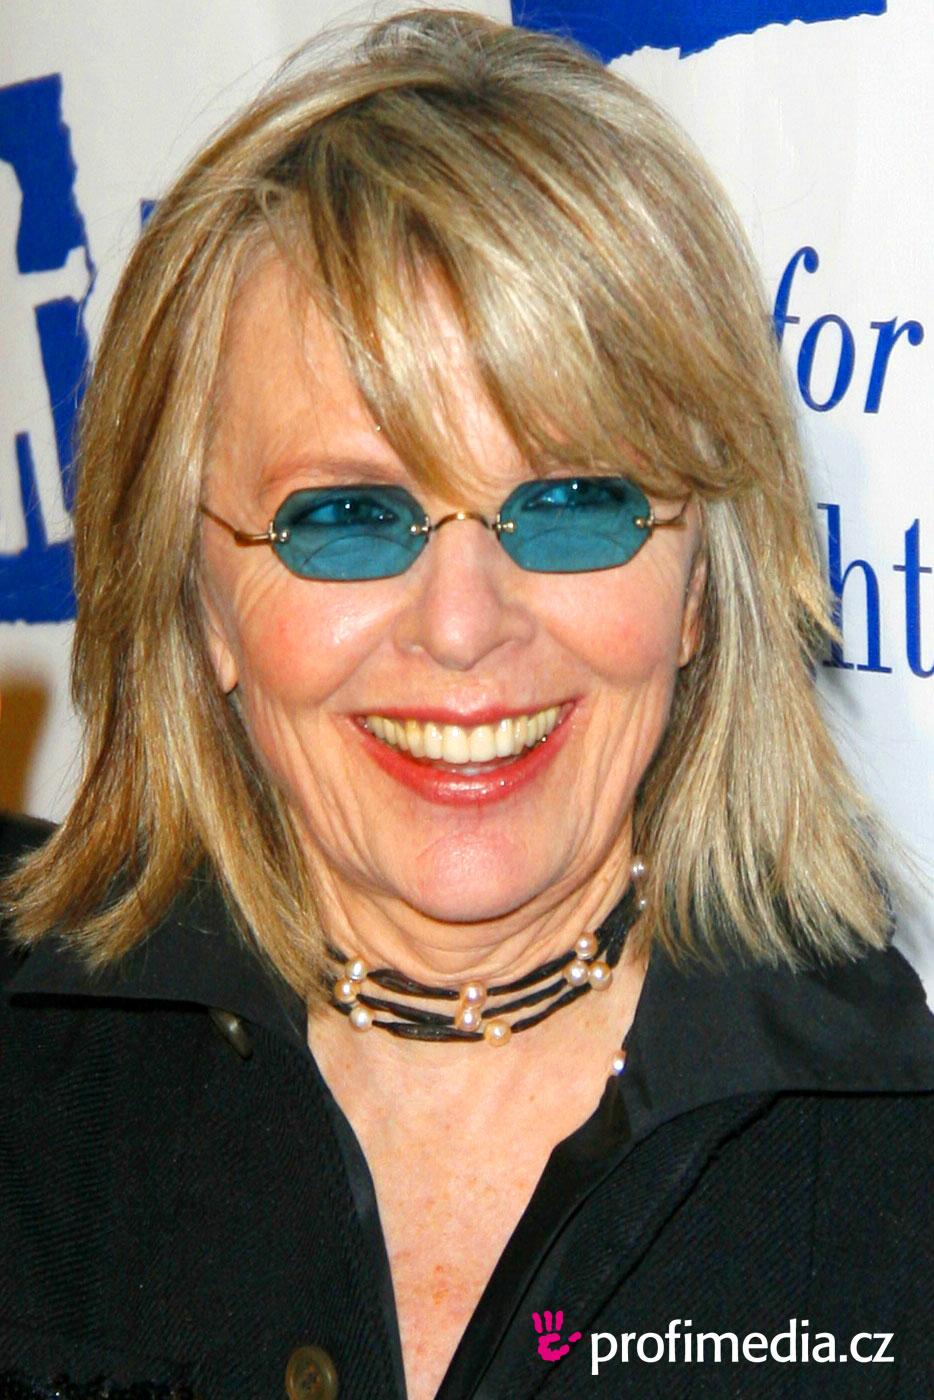 Diane Keaton Hairstyle Easyhairstyler